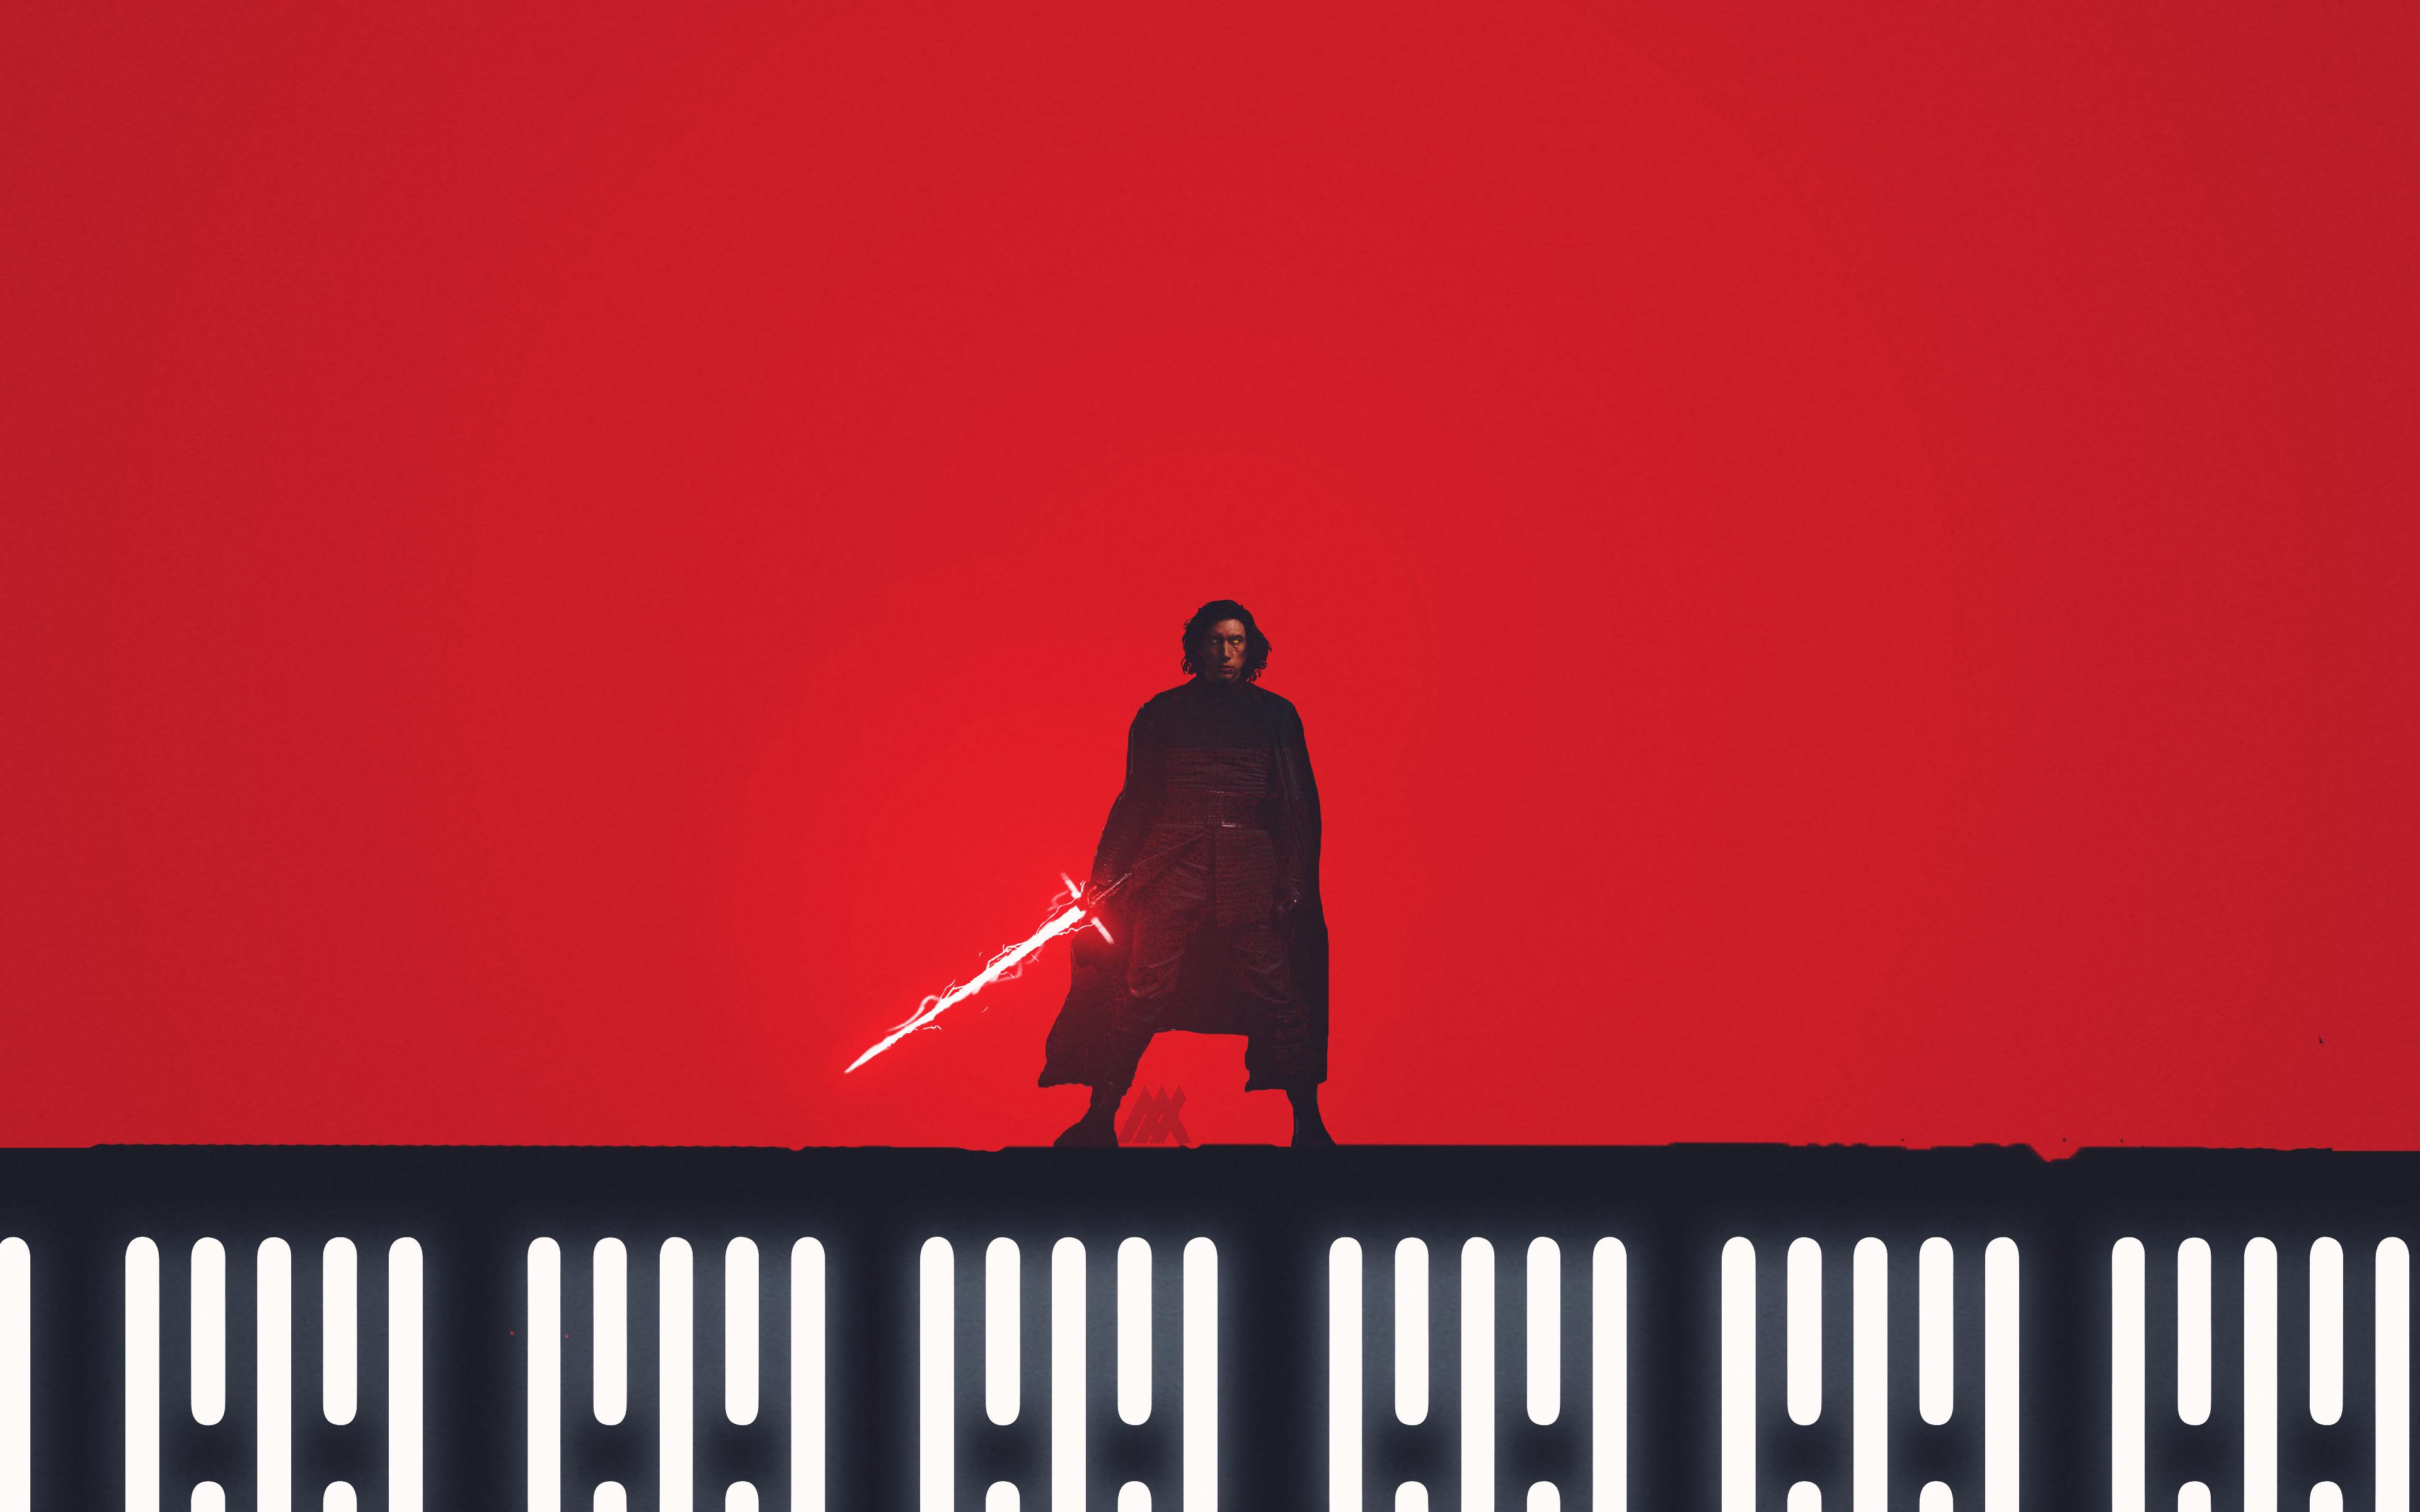 Star Wars Kylo Ren 4k Wallpaper Singebloggg